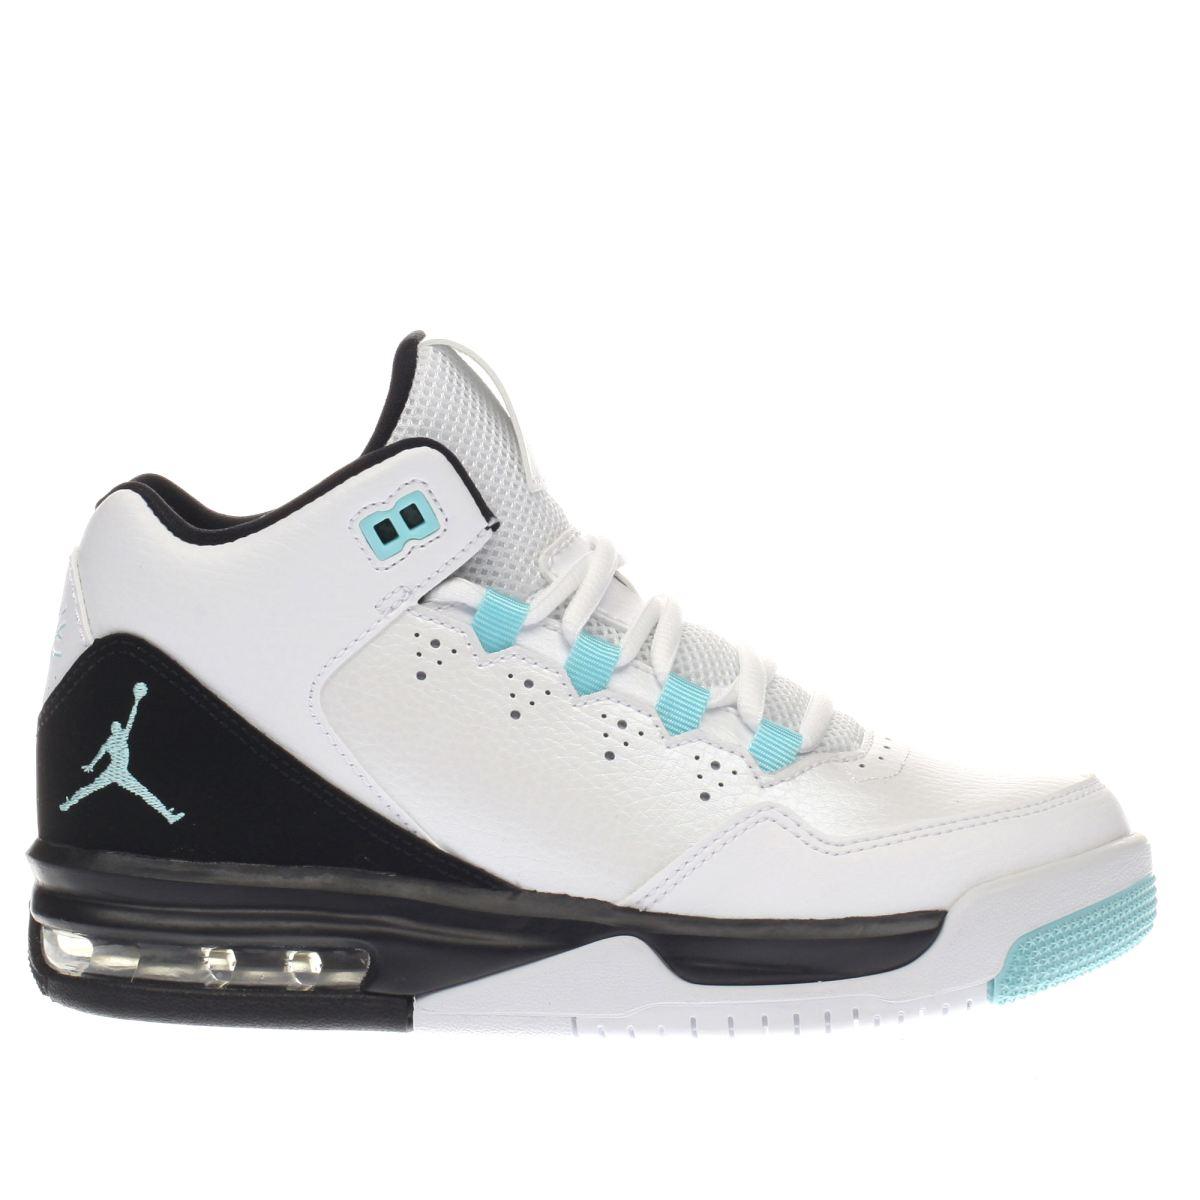 nike jordan Nike Jordan White & Black Jordan Flight Origin Unisex Youth